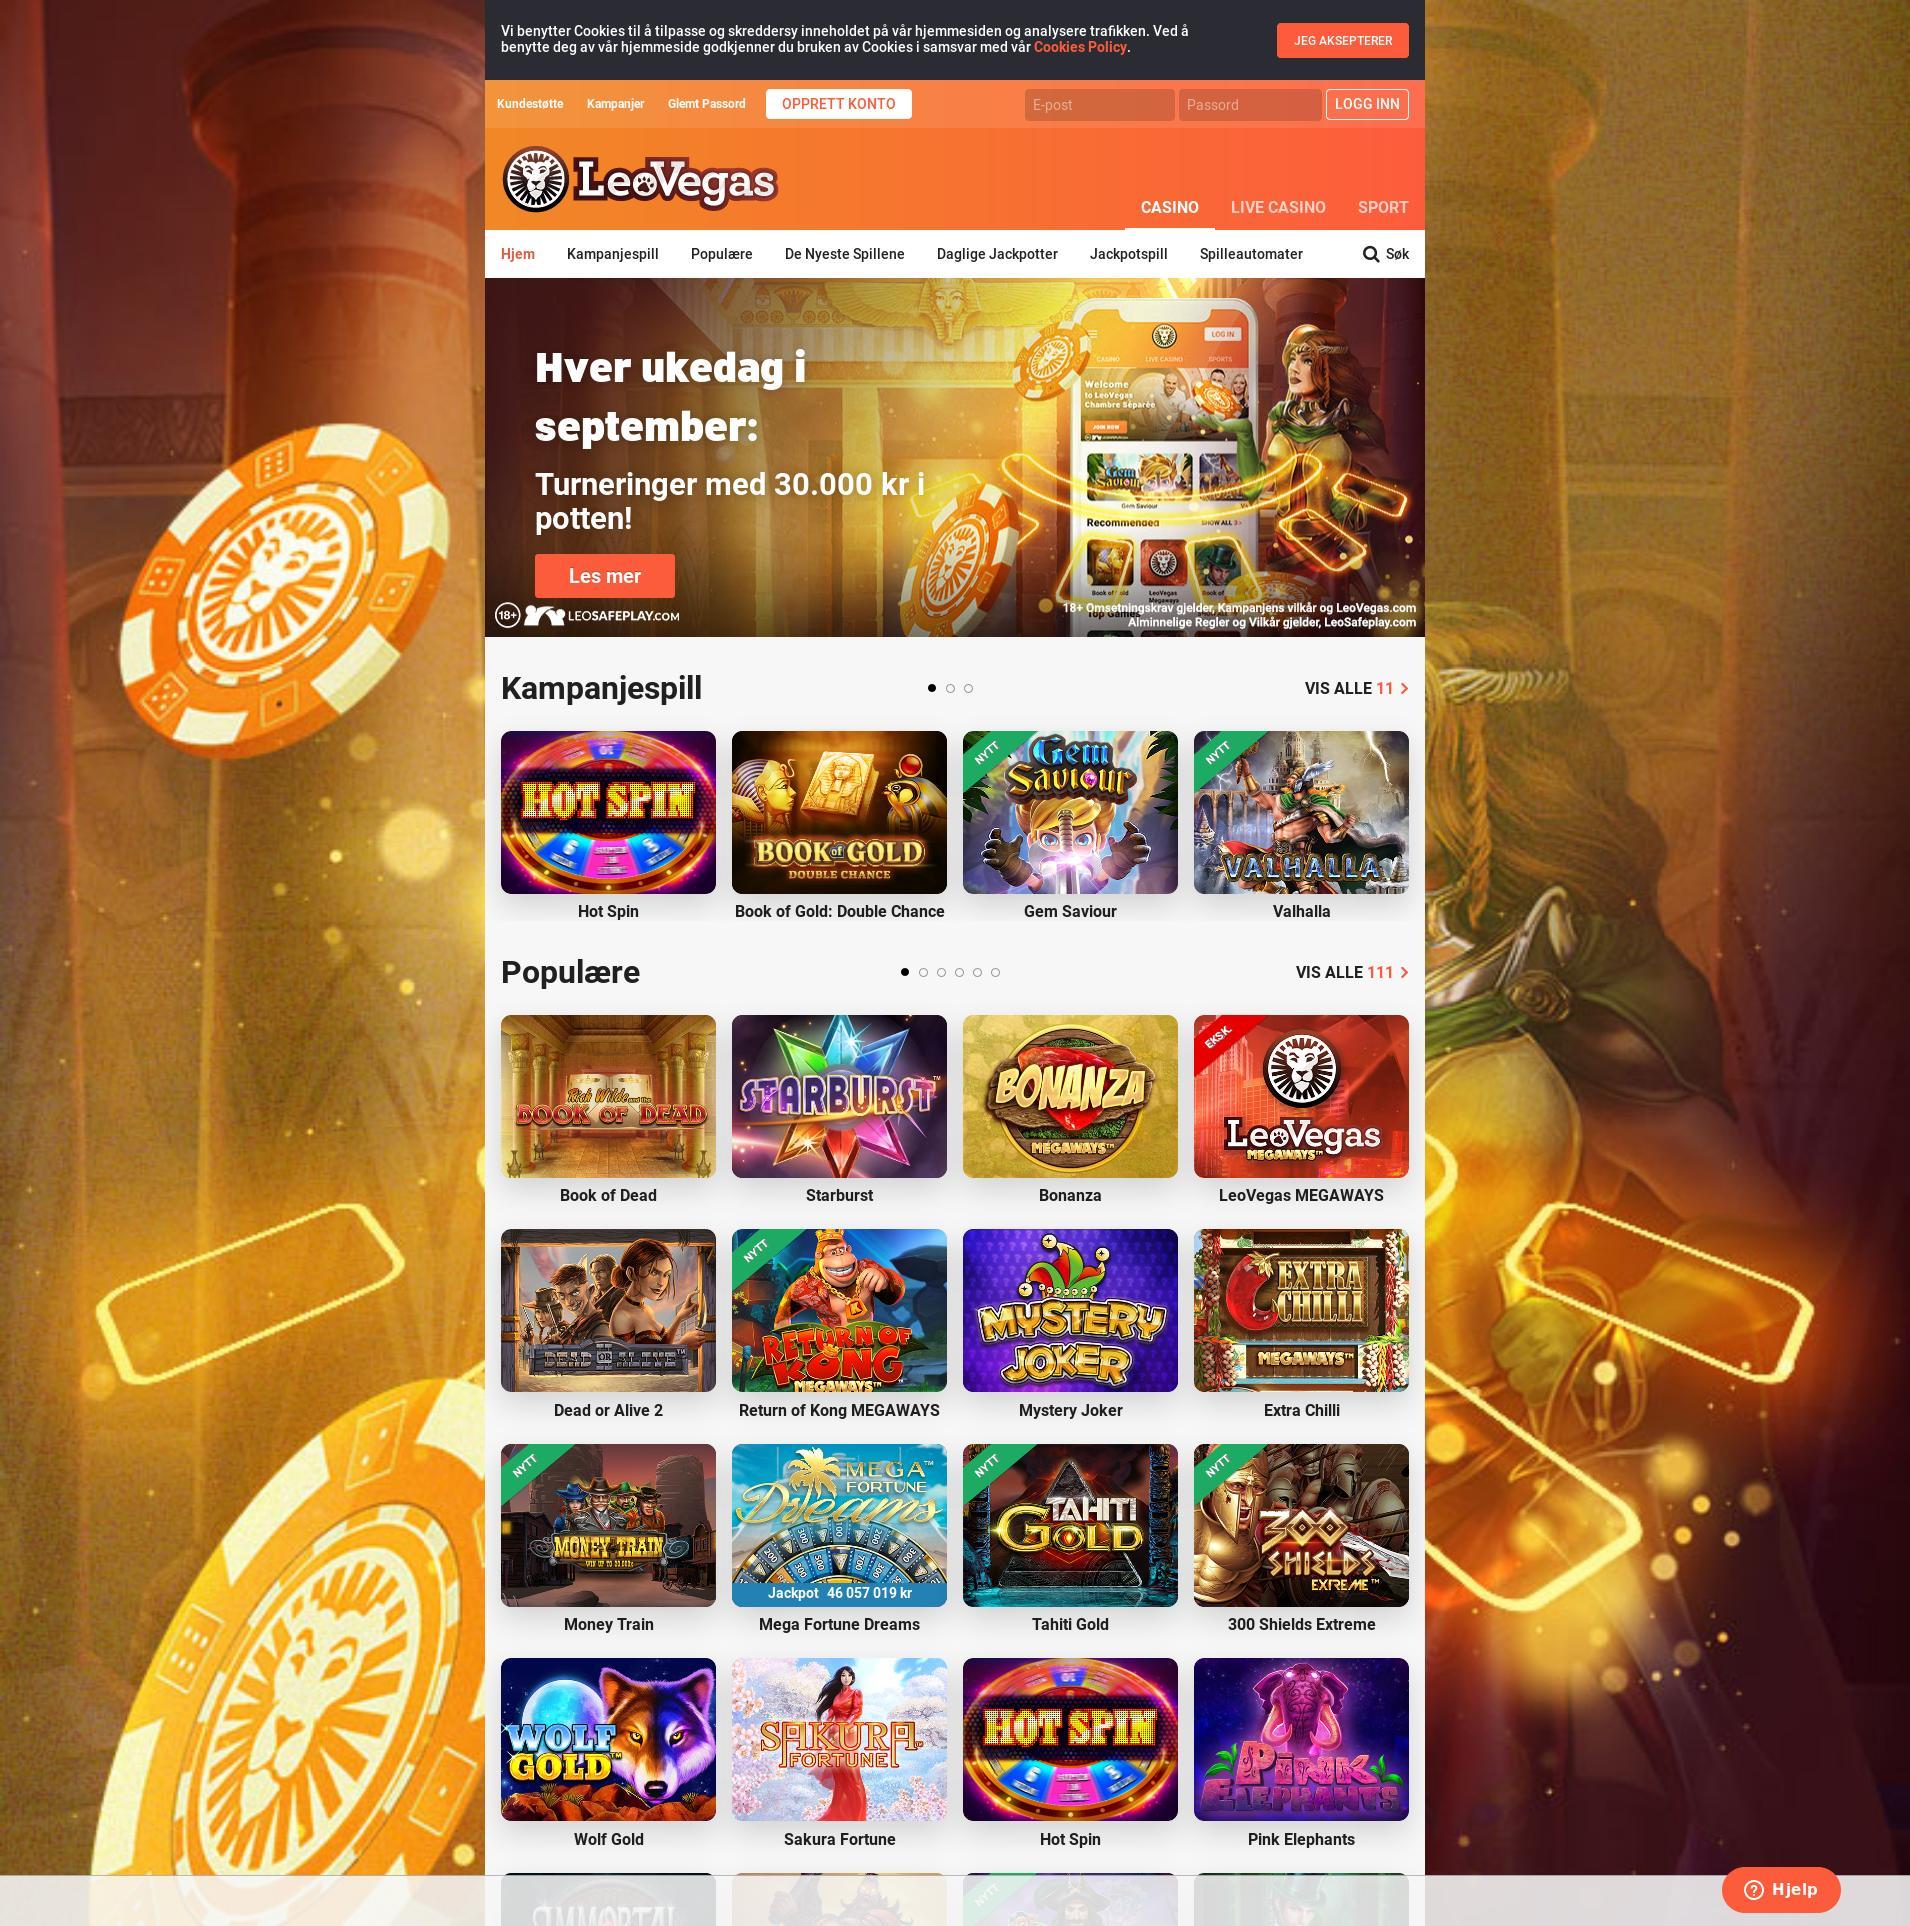 Casino screen Lobby 2019-09-19 pentru Norvegia